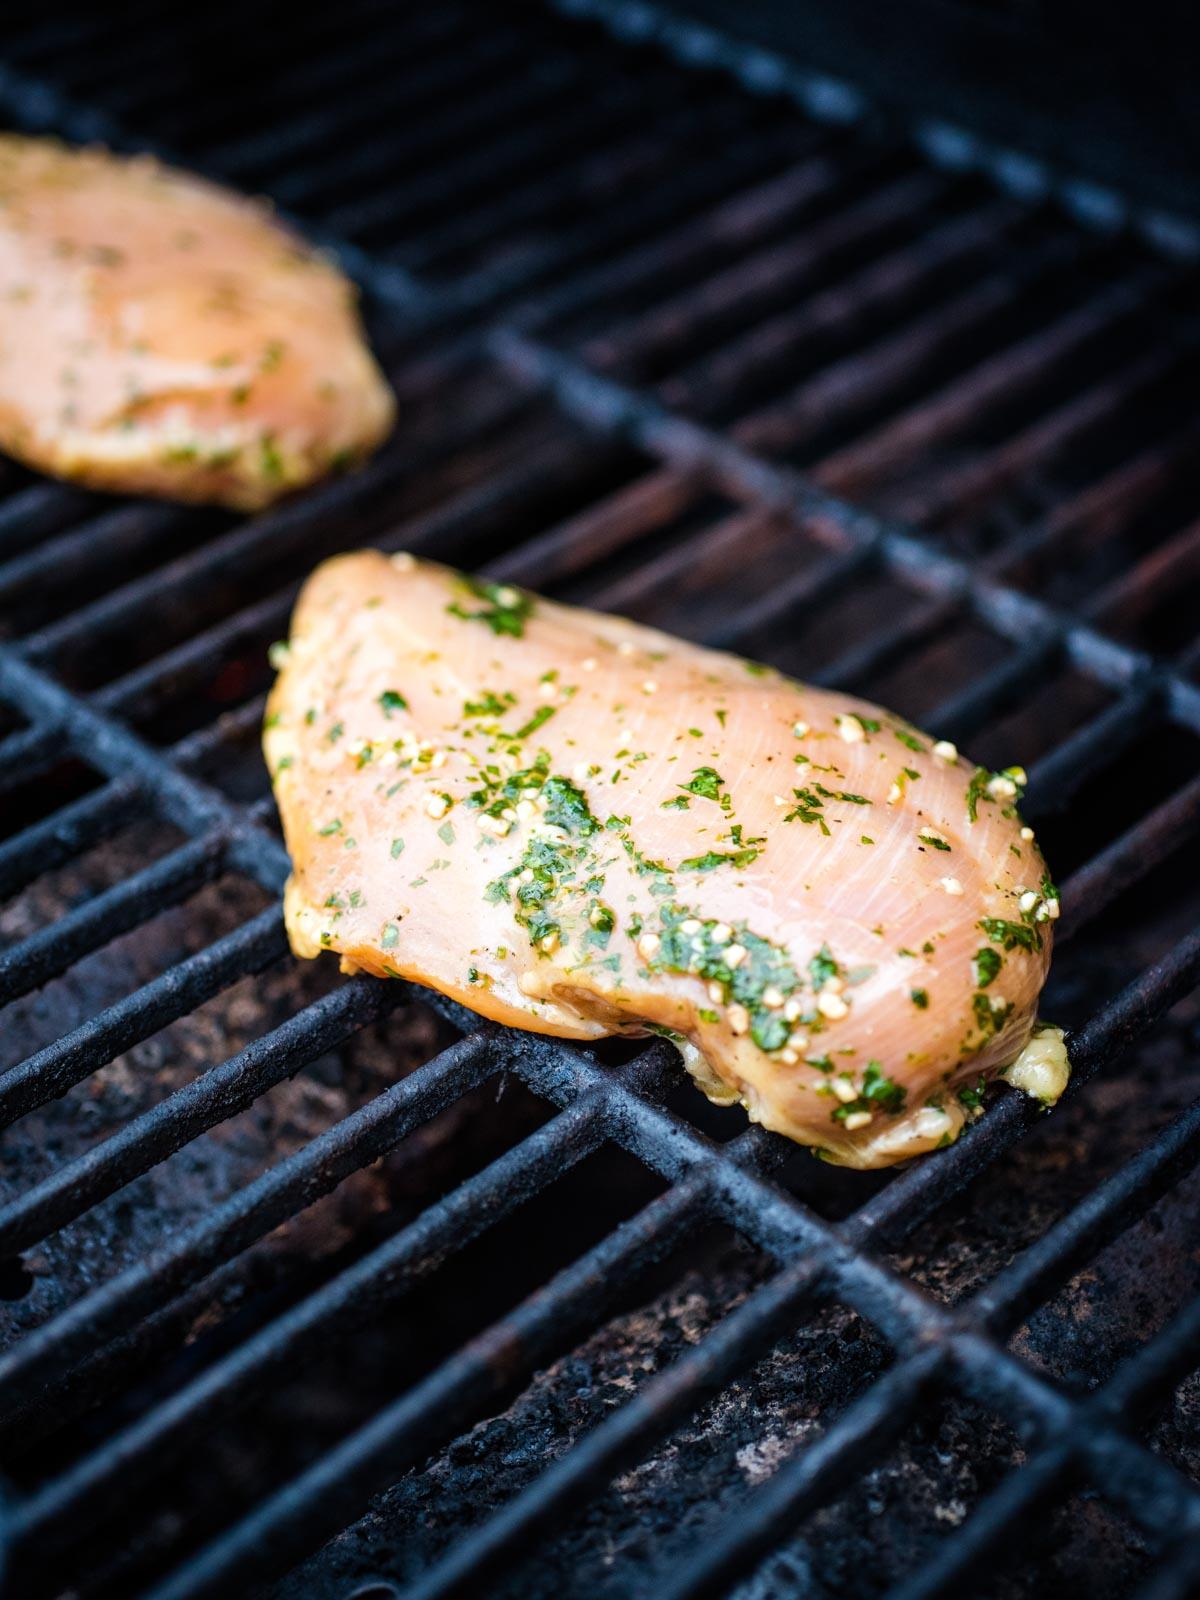 seasoned marinated chicken on grill